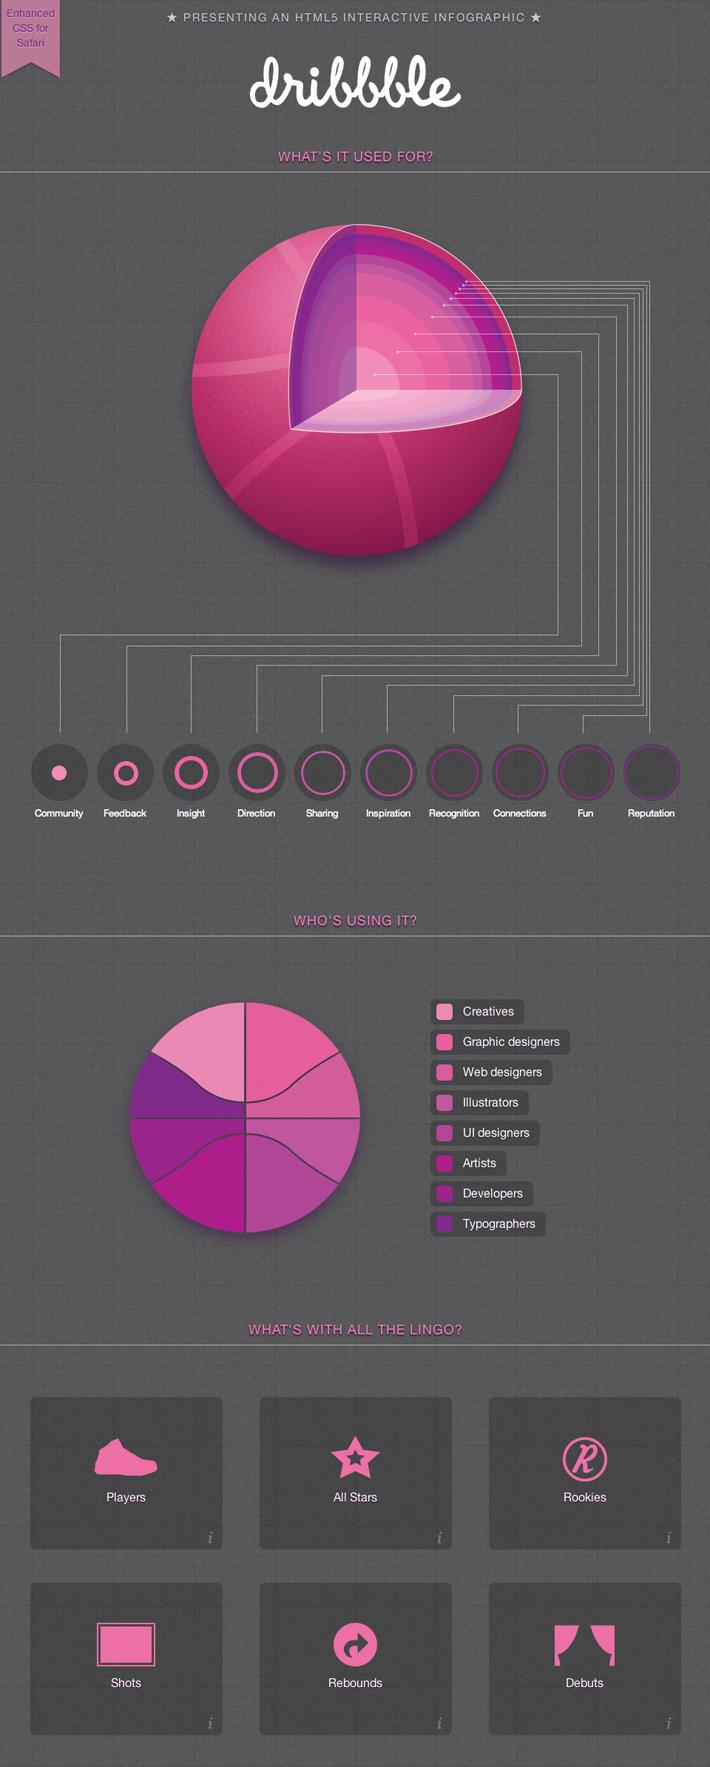 Dribbble.com Infographic